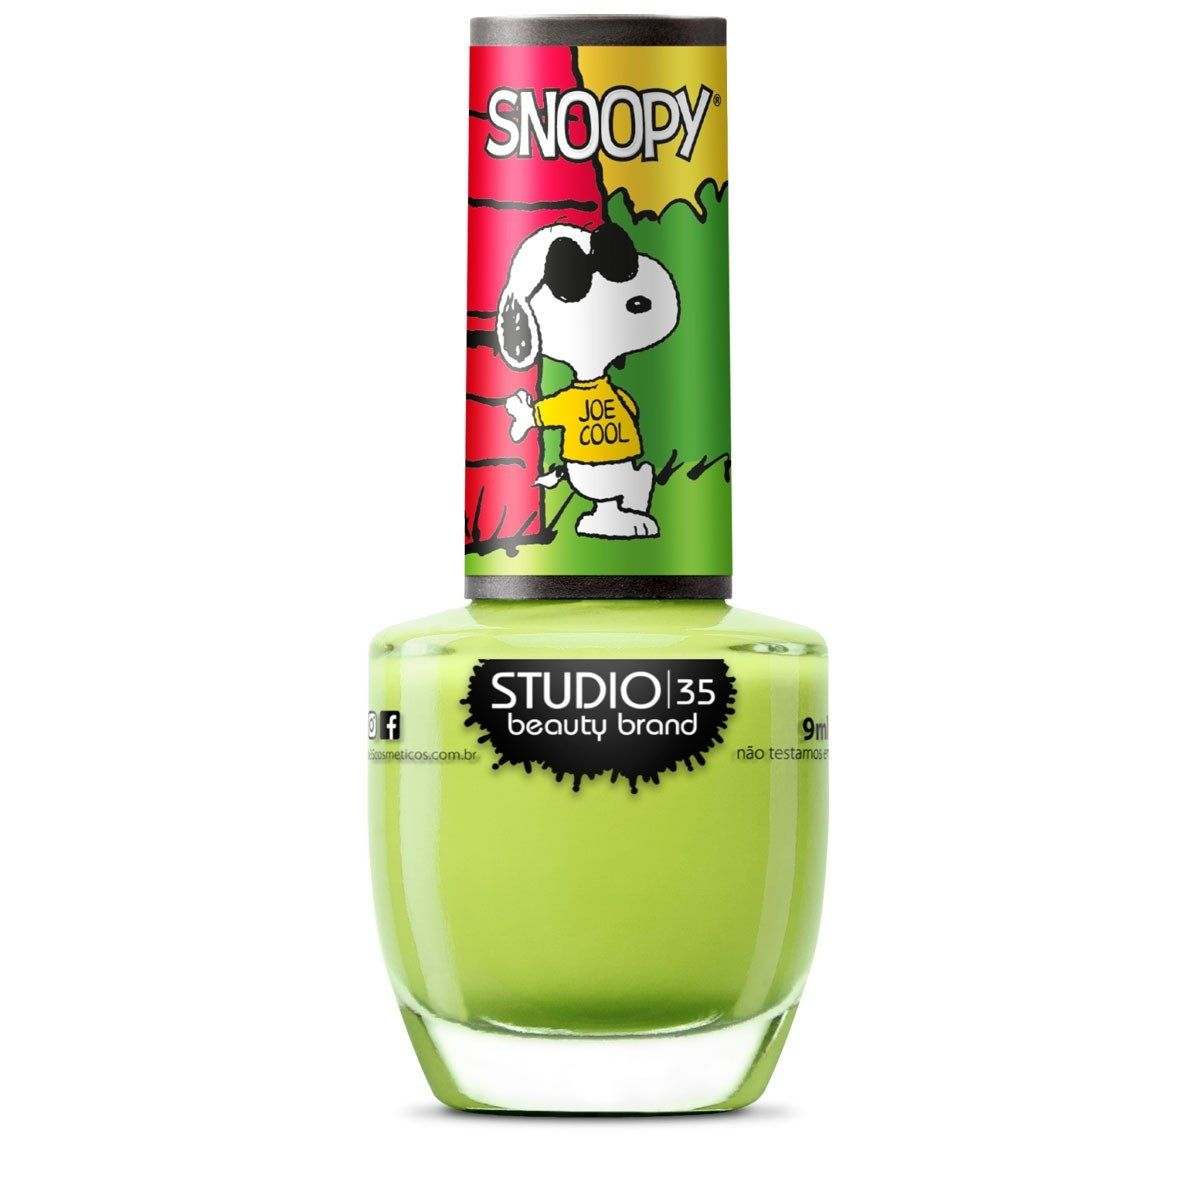 Esmalte Coleção Snoopy Cor #relax,joecool -  9ml-Studio 35